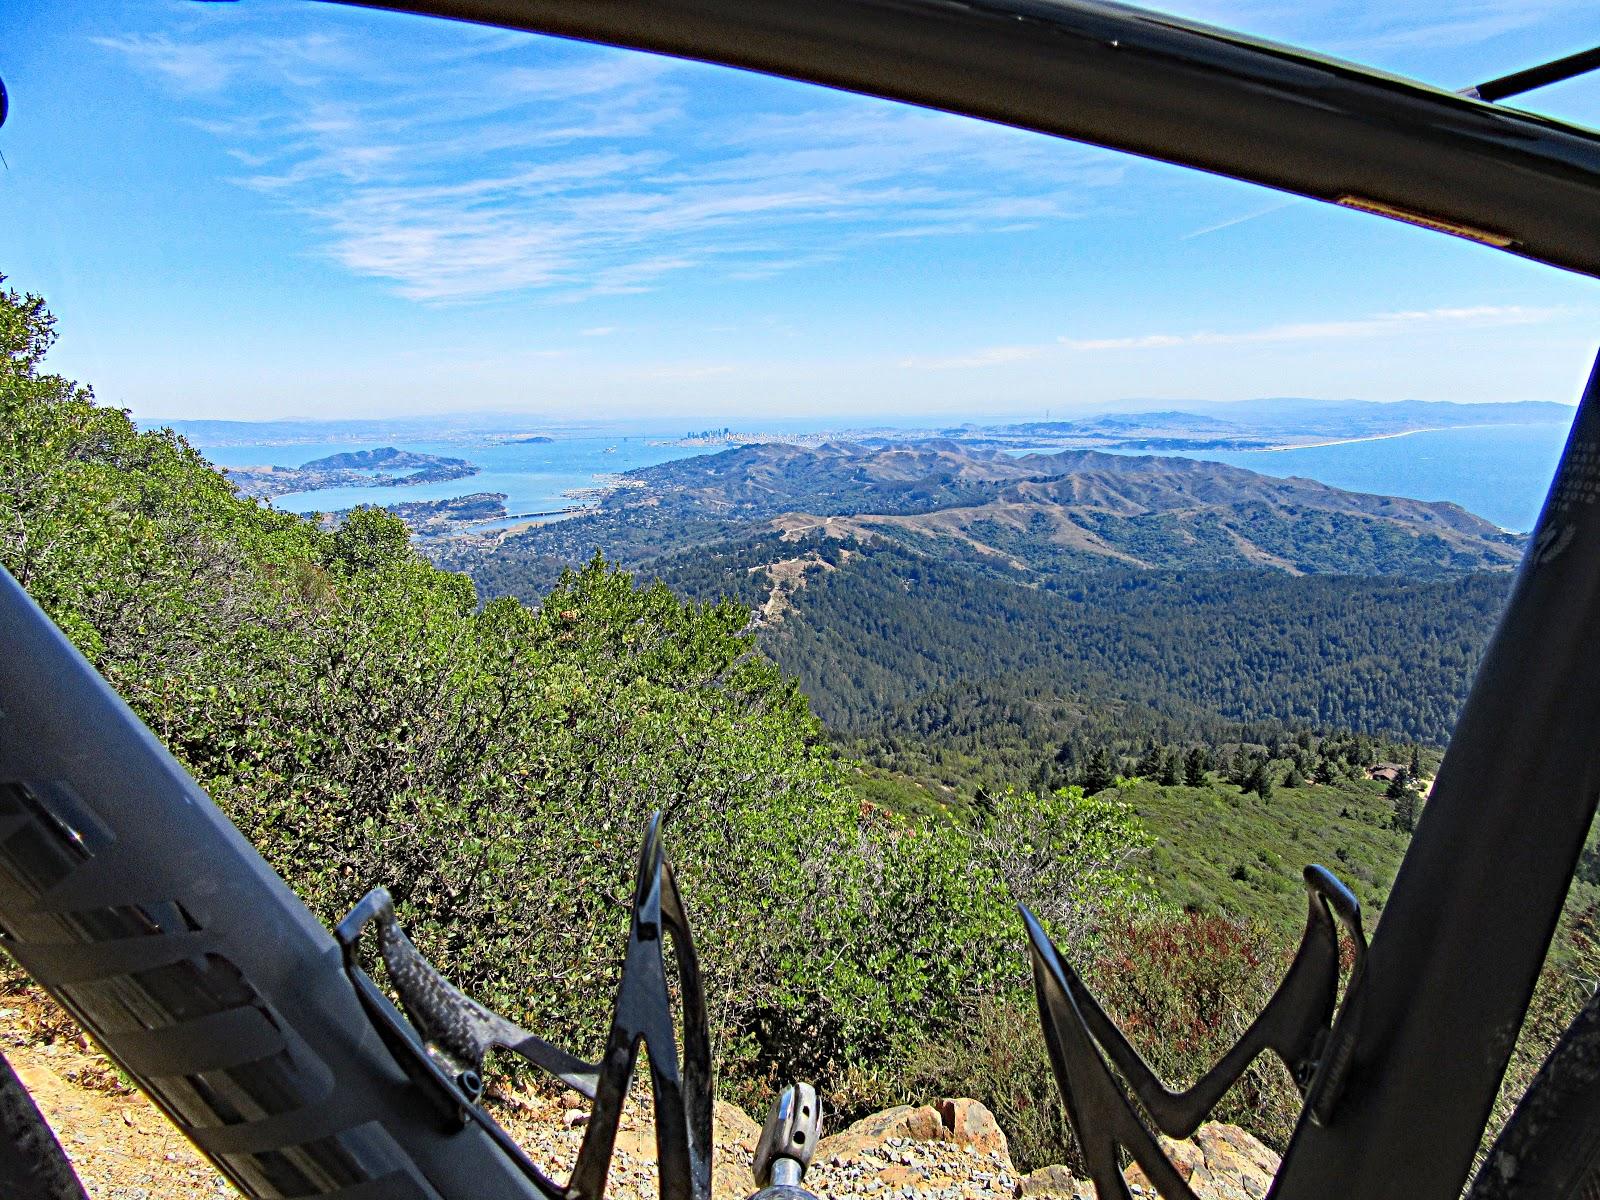 Cycling Mt. Tamalpais from Alpine Dam - view of SF Bay through bike frame